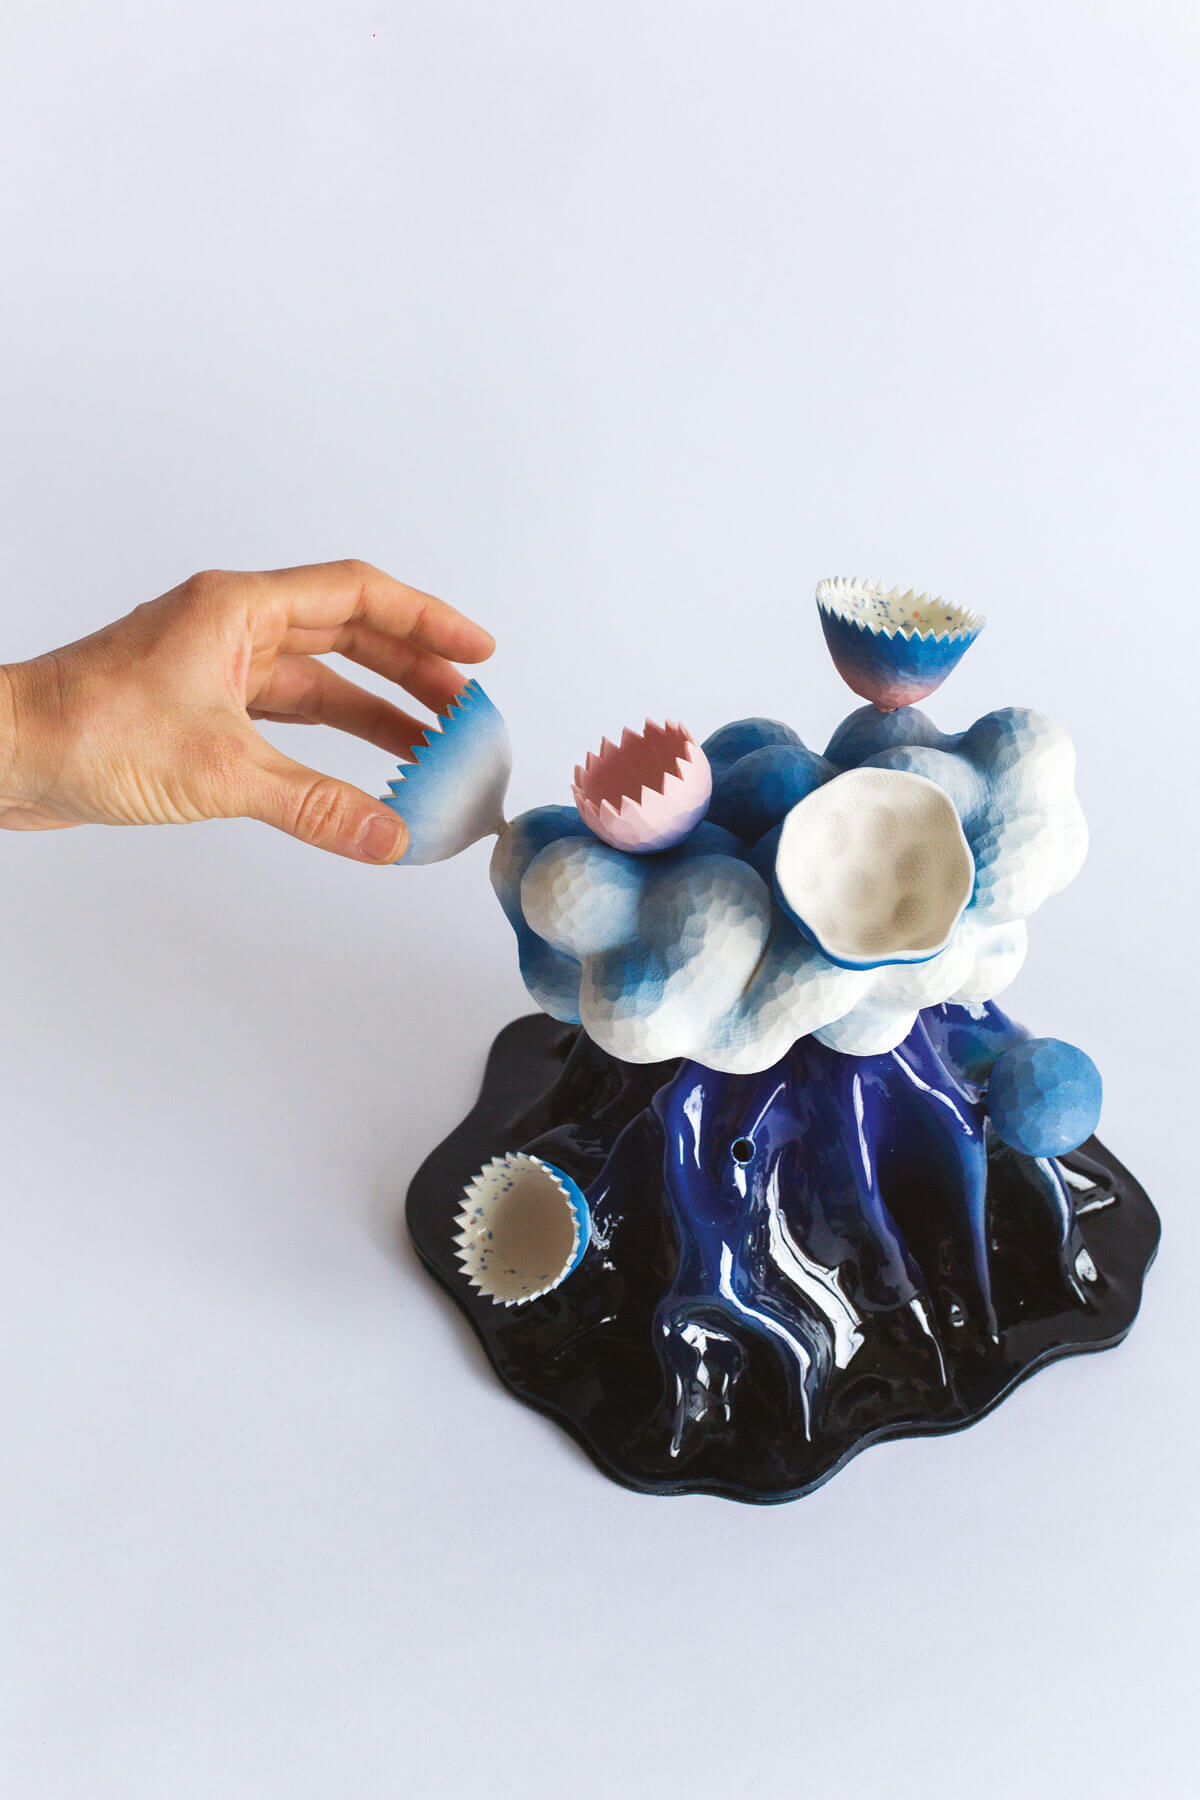 kartini Thomas plasticienne porcelaine